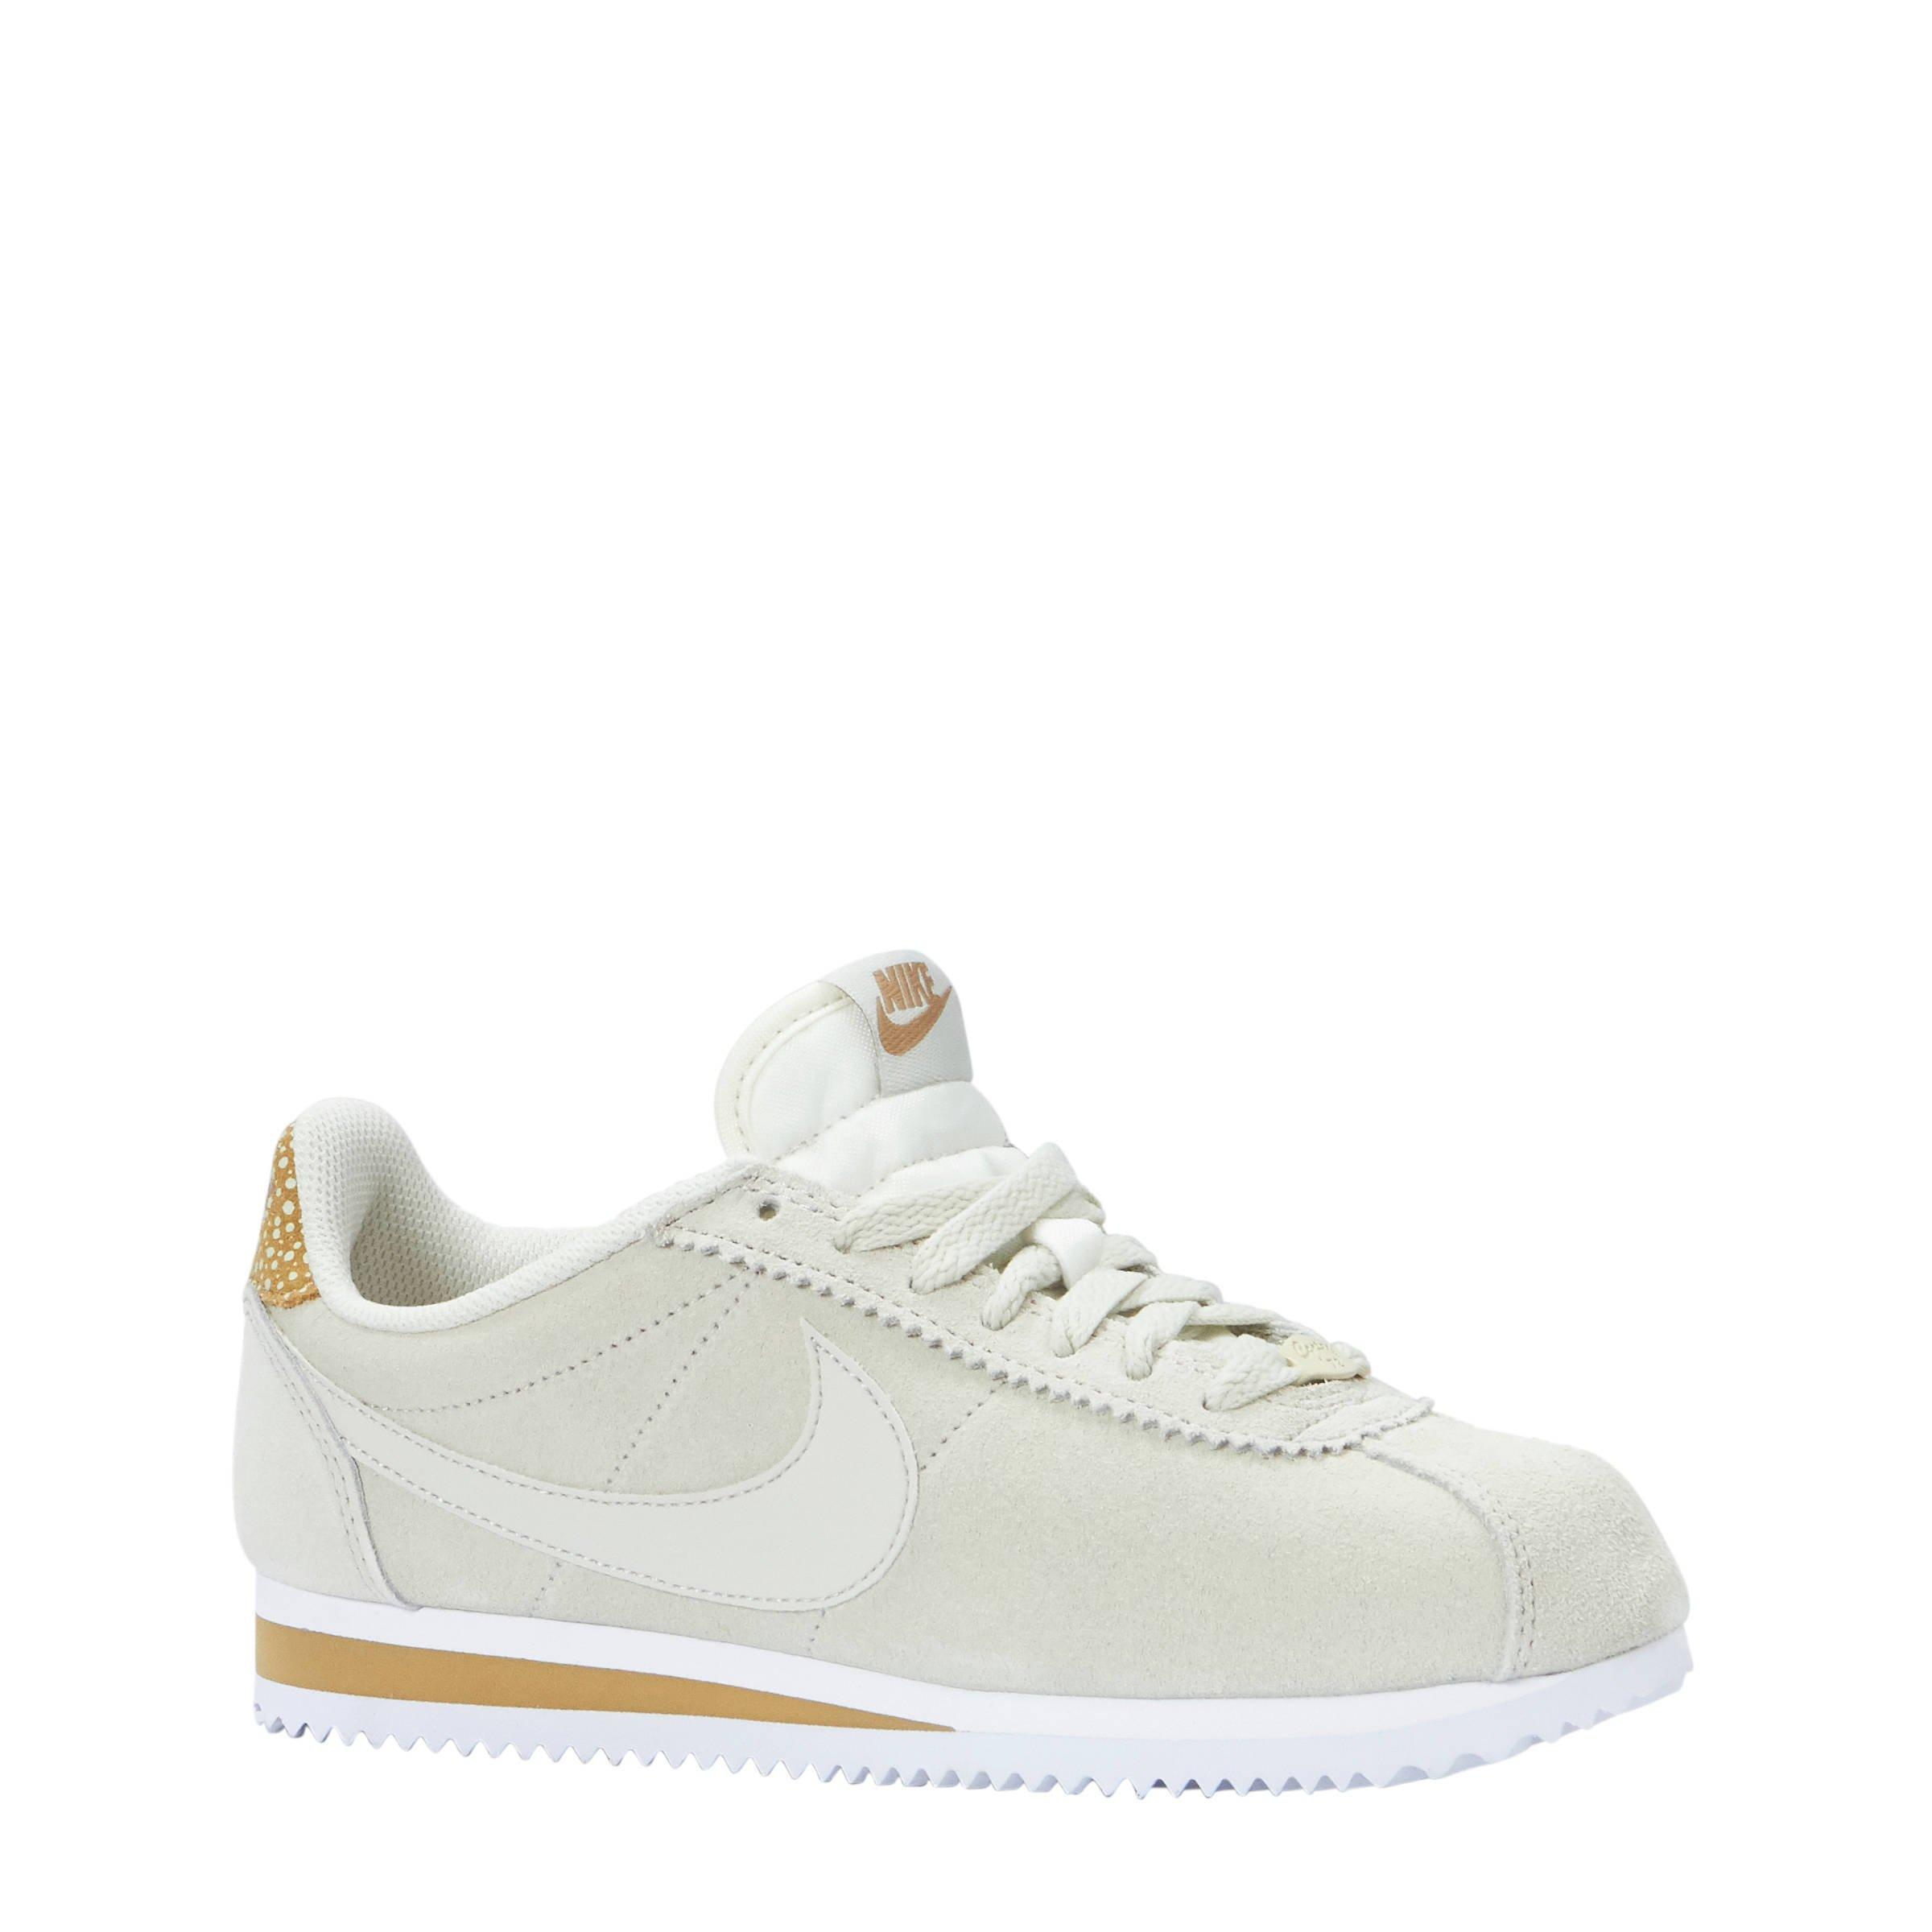 286dec712fe nike-classic-cortez-premium-suede-sneakers-beige-beige-0191887936091.jpg